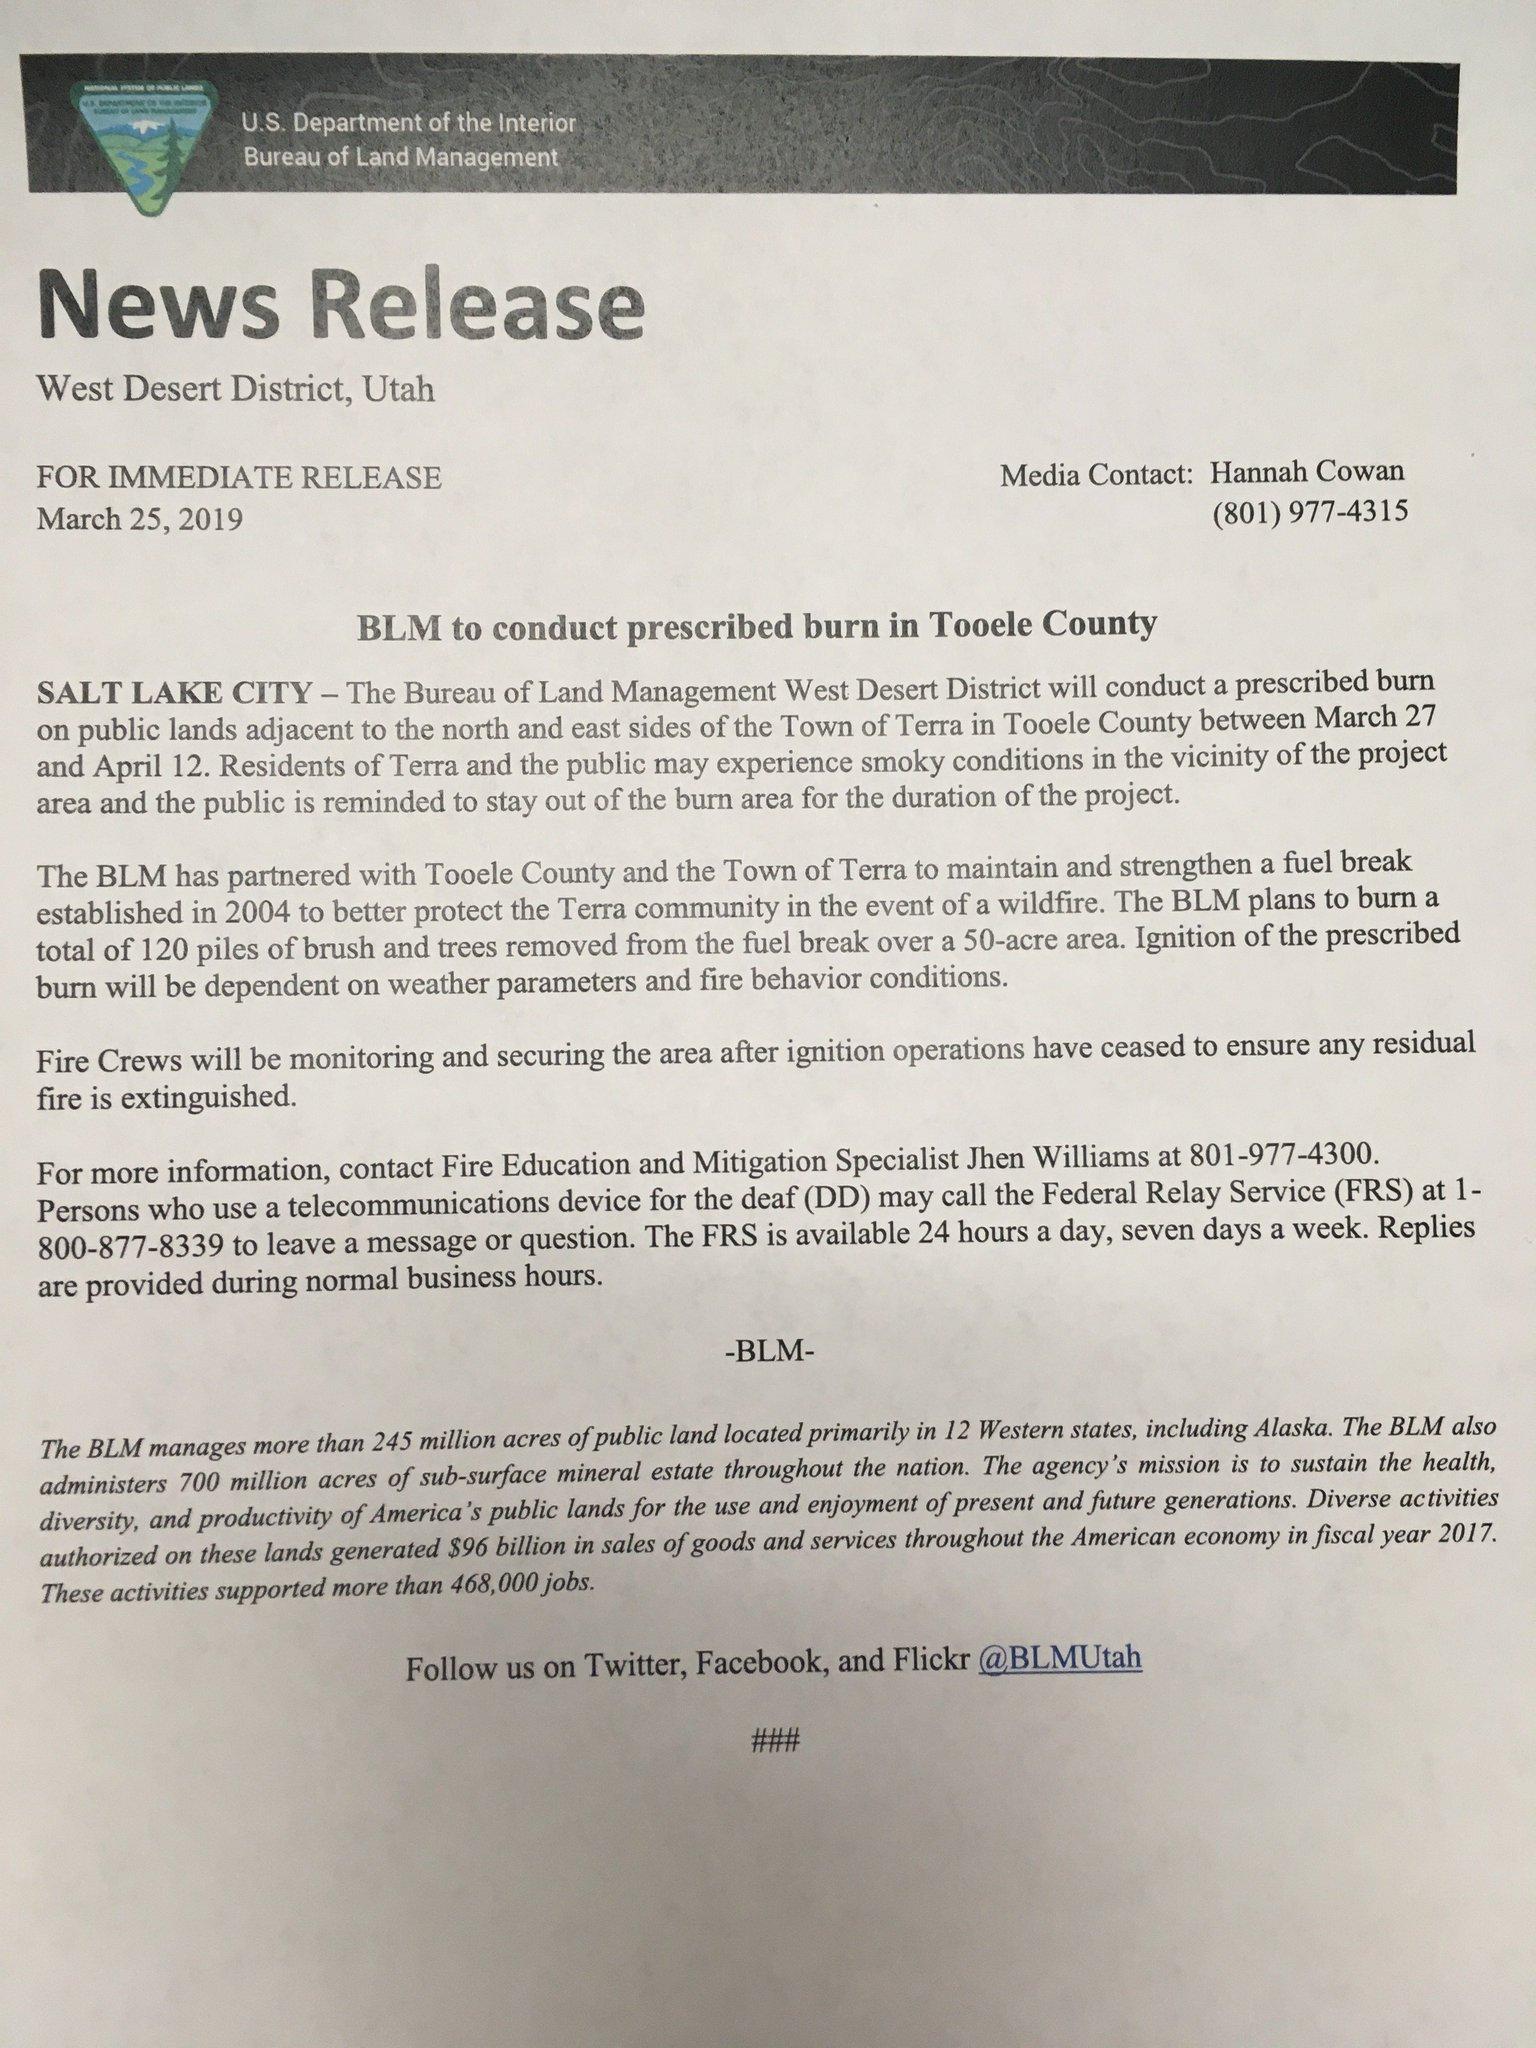 Utah Fire Info on Twitter: